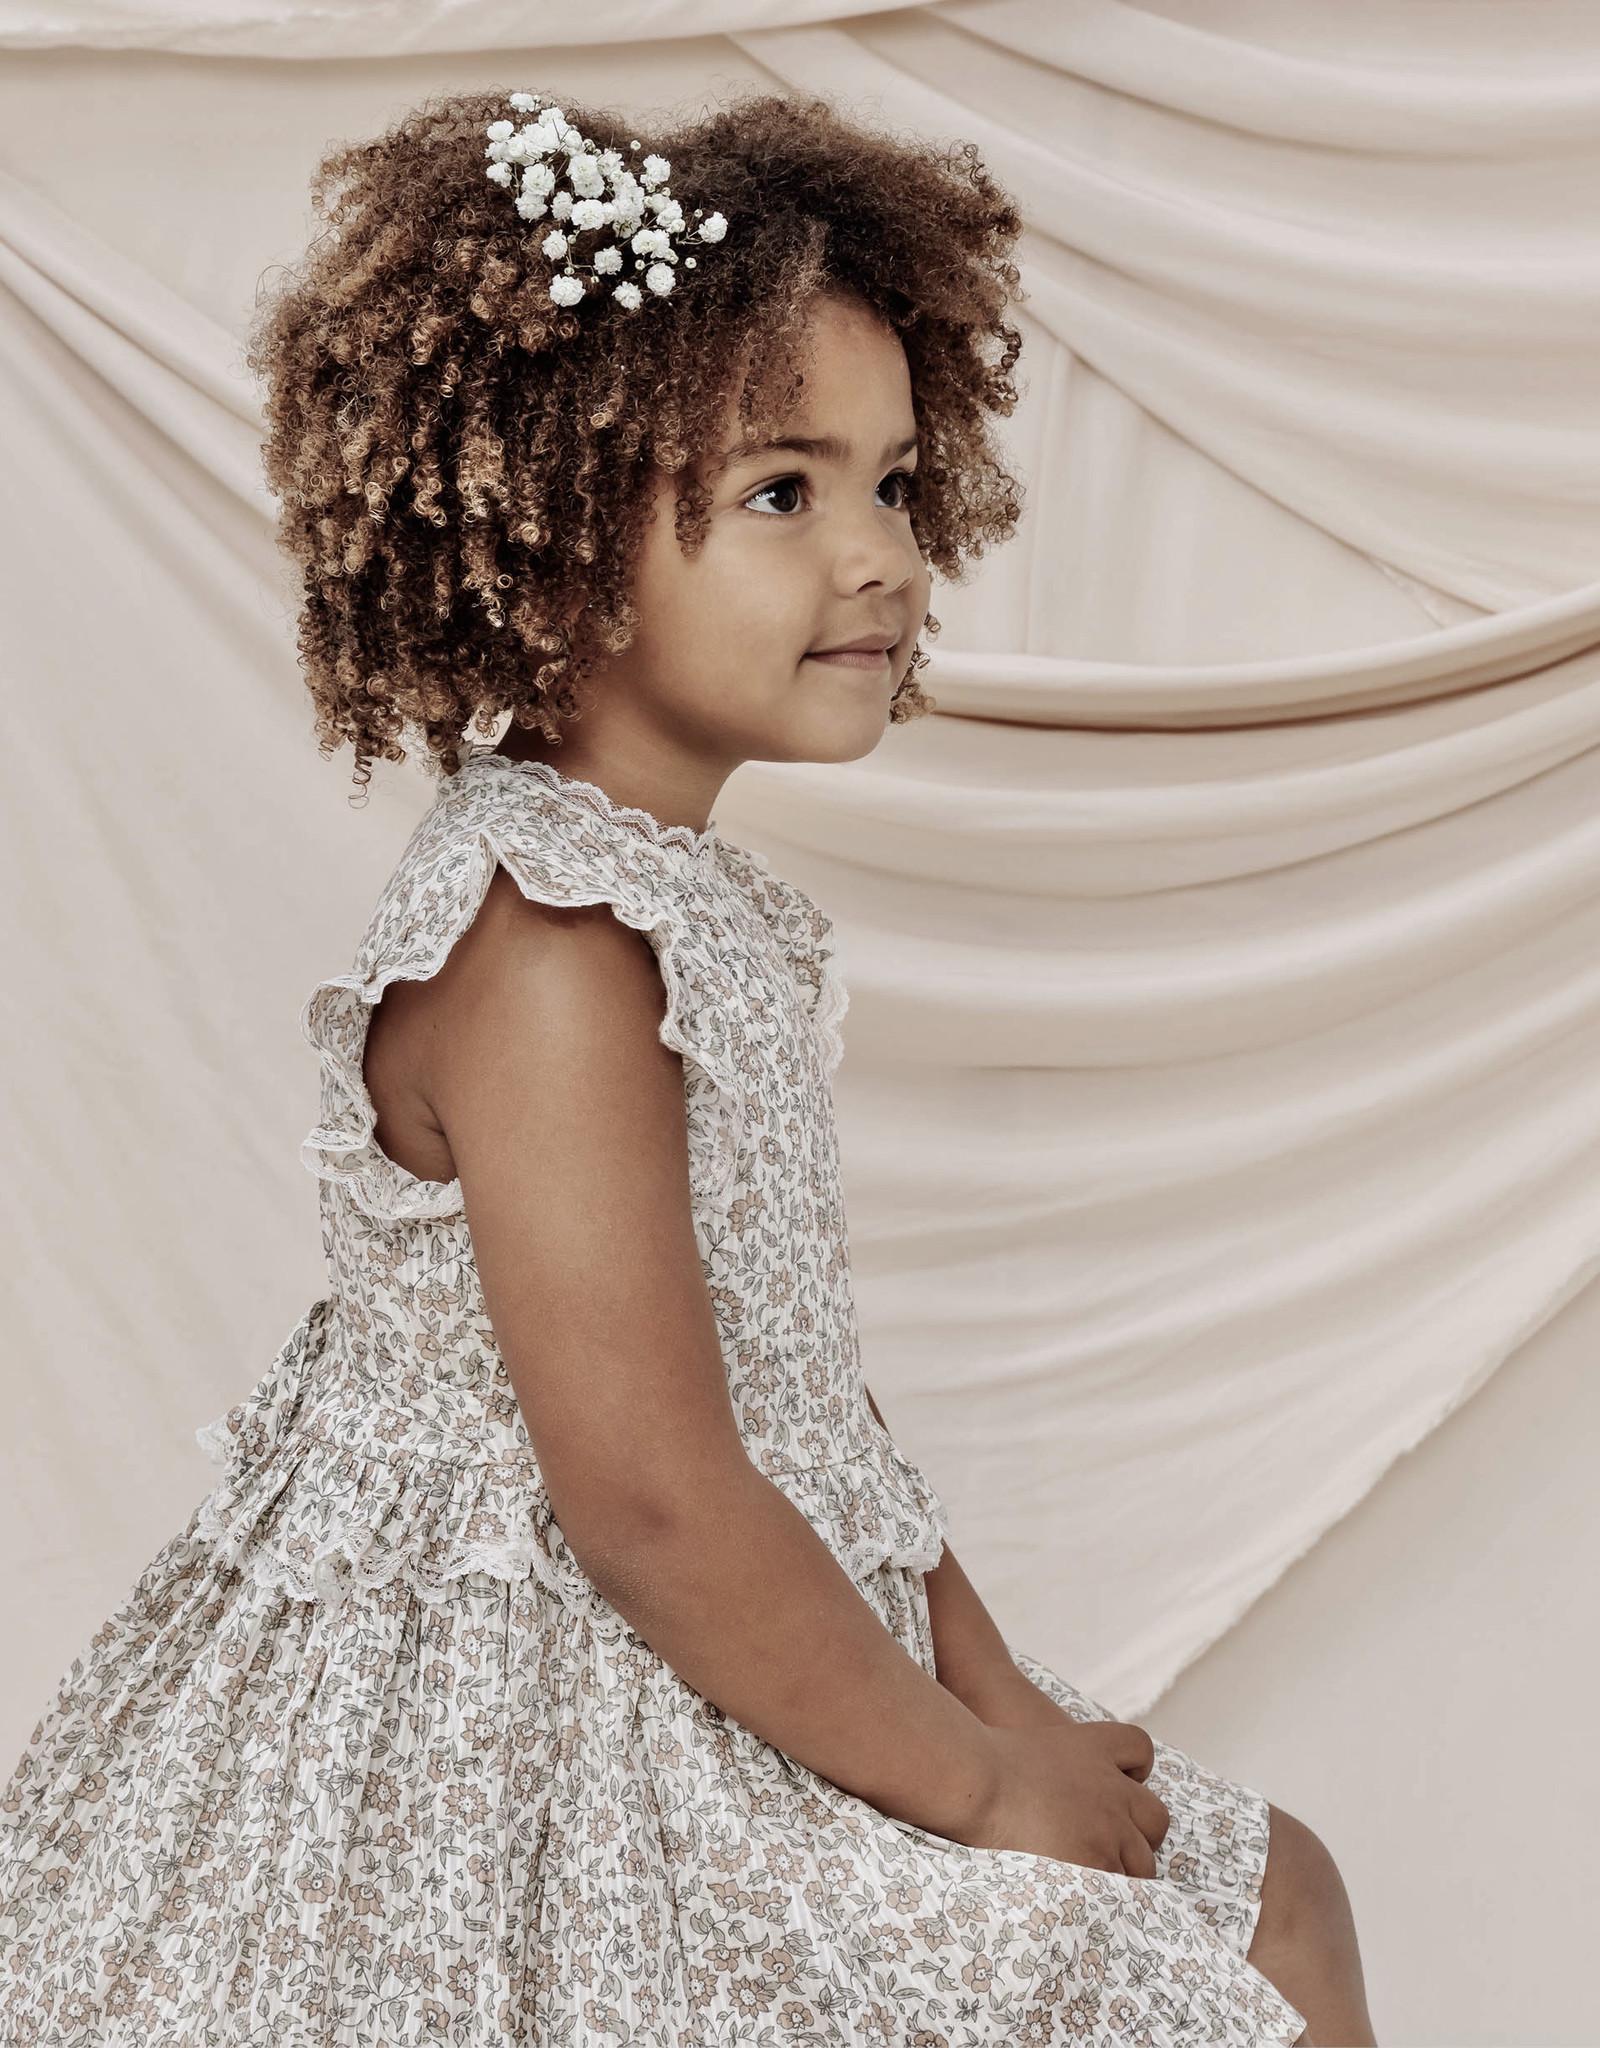 Nora Lee Alice Beige Floral Dress Ruffle Waist